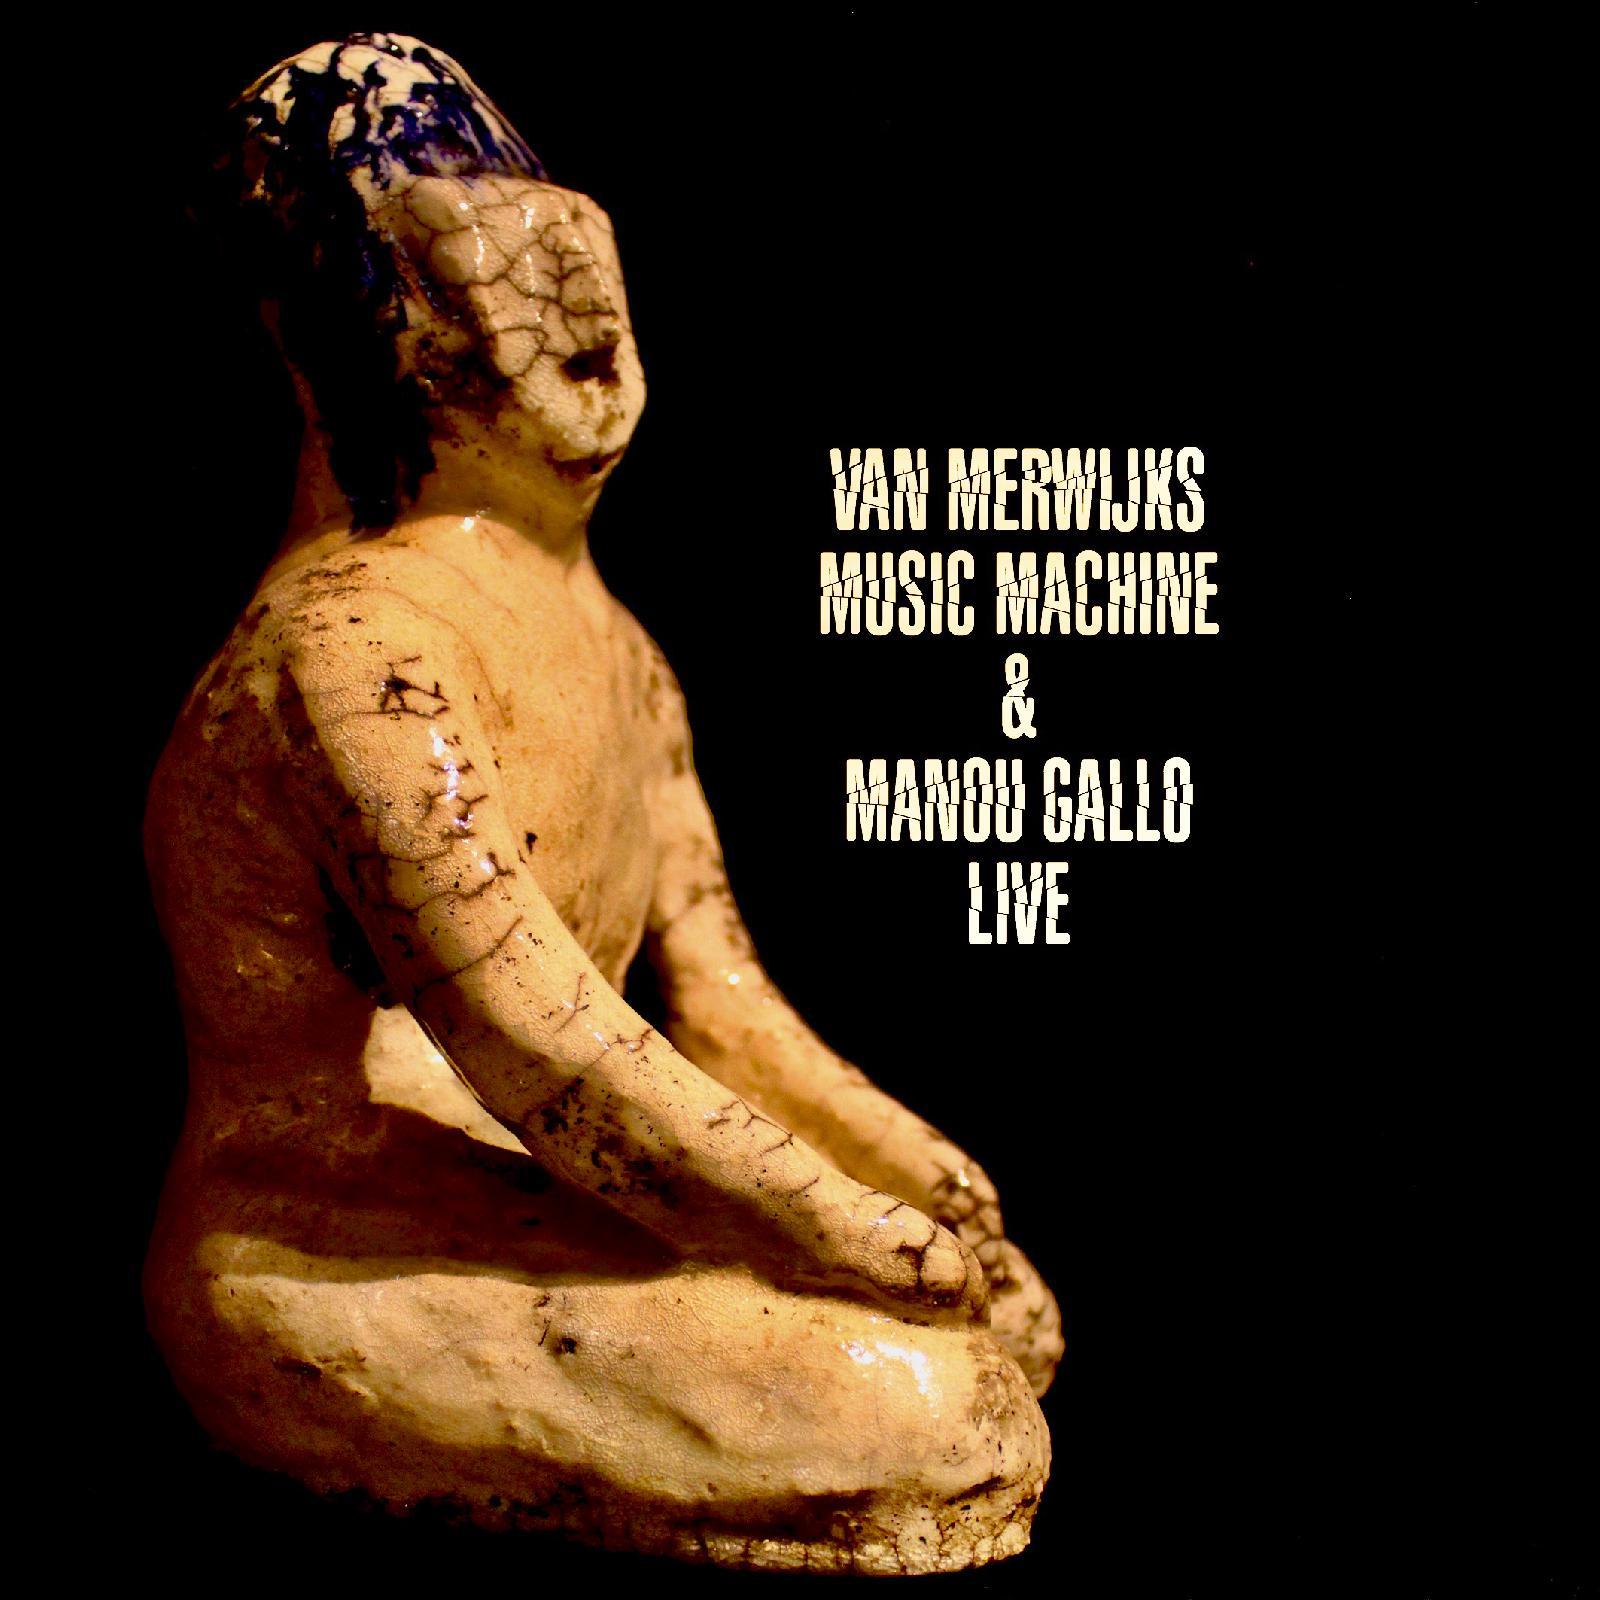 Live with Manou Gallo